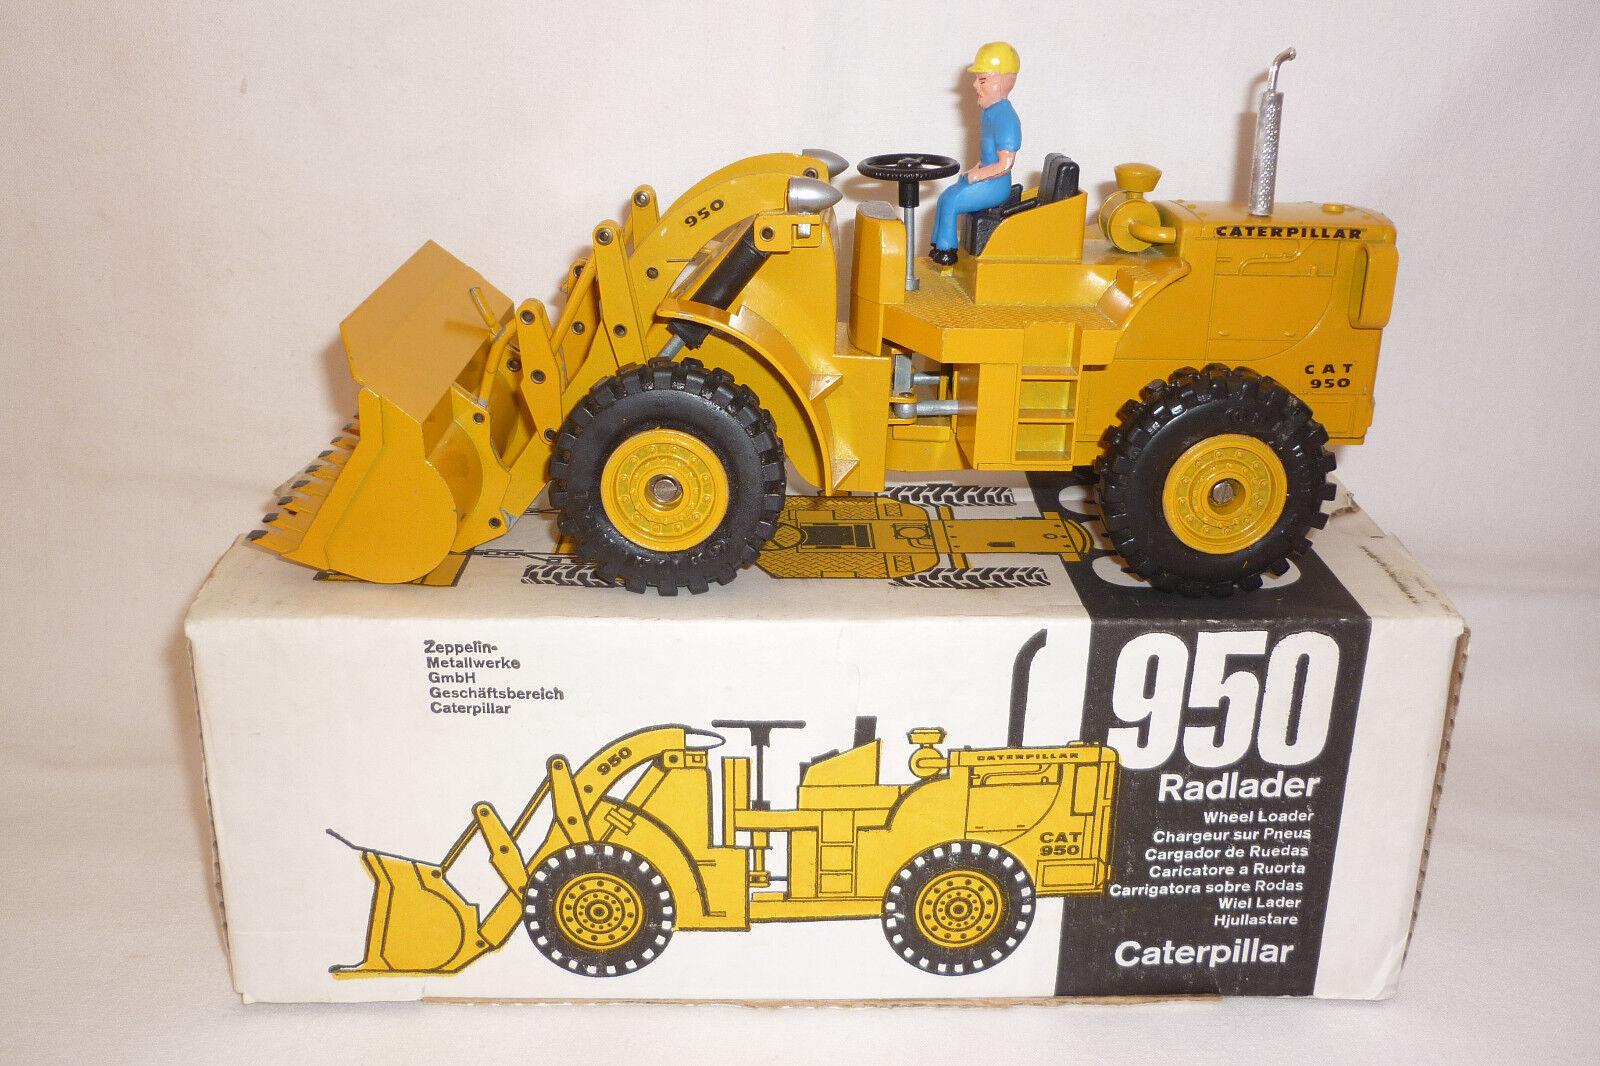 Strenco - Metal Model - Caterpillar 950 - Radlader - Ovp - 1 25 - (7.bm-169)